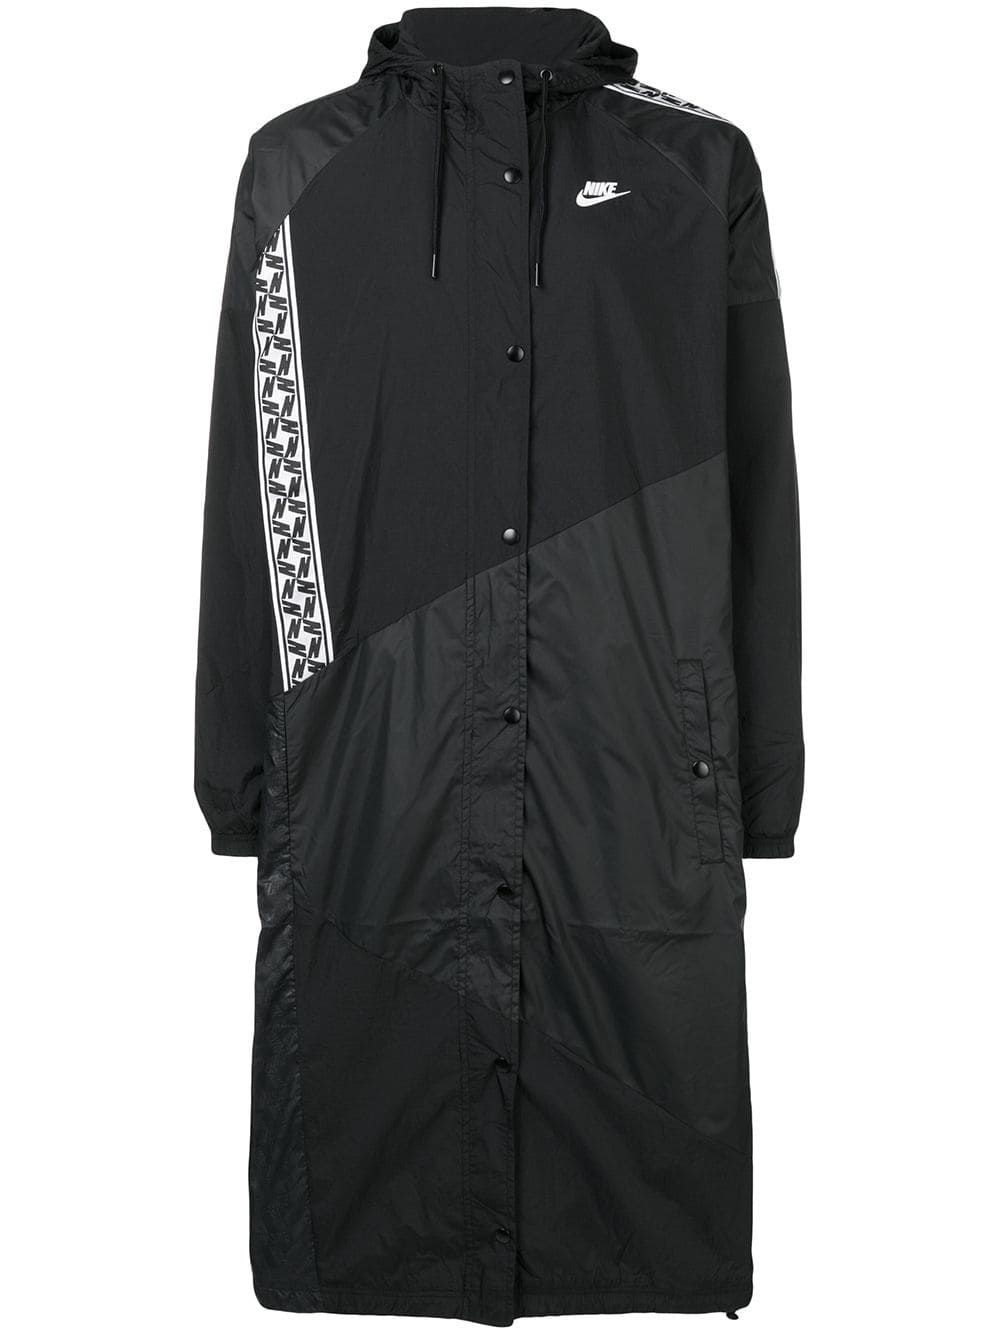 595d57d1fa4e NIKE NIKE WOVEN LONG JACKET - BLACK.  nike  cloth